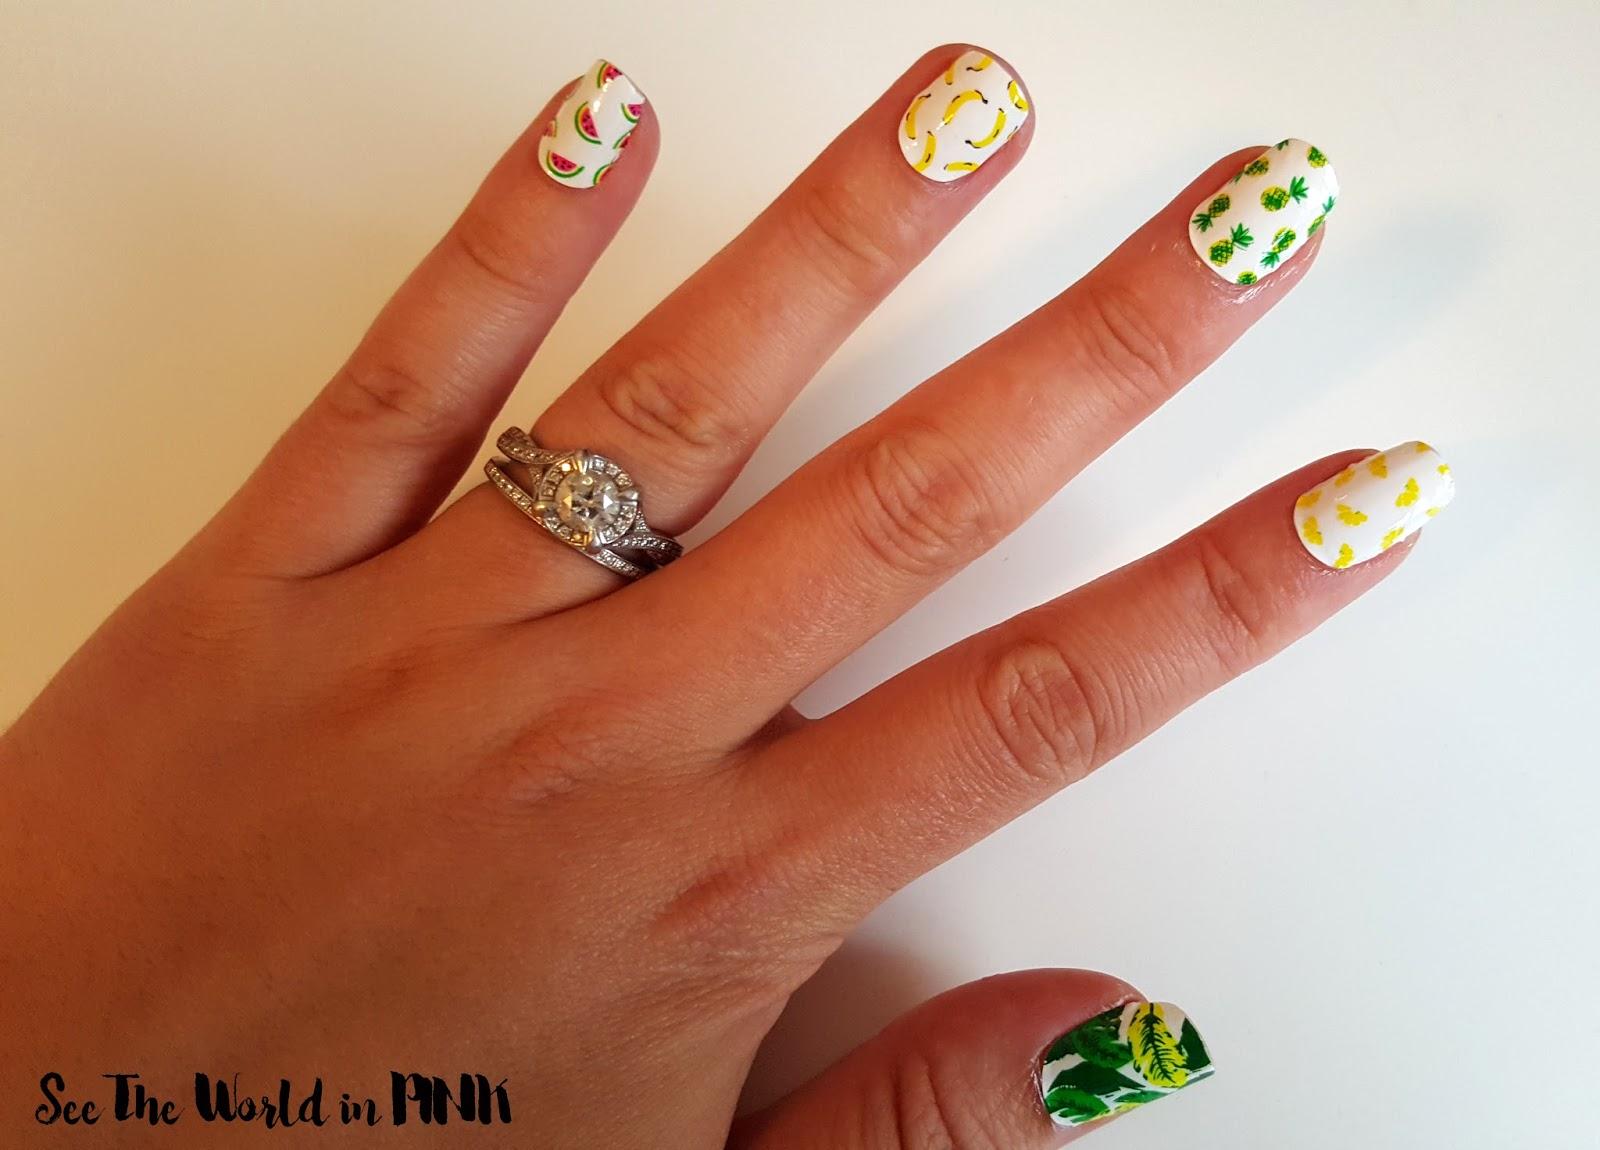 Manicure Monday - Scratch Nail Wraps & Fruit Basket